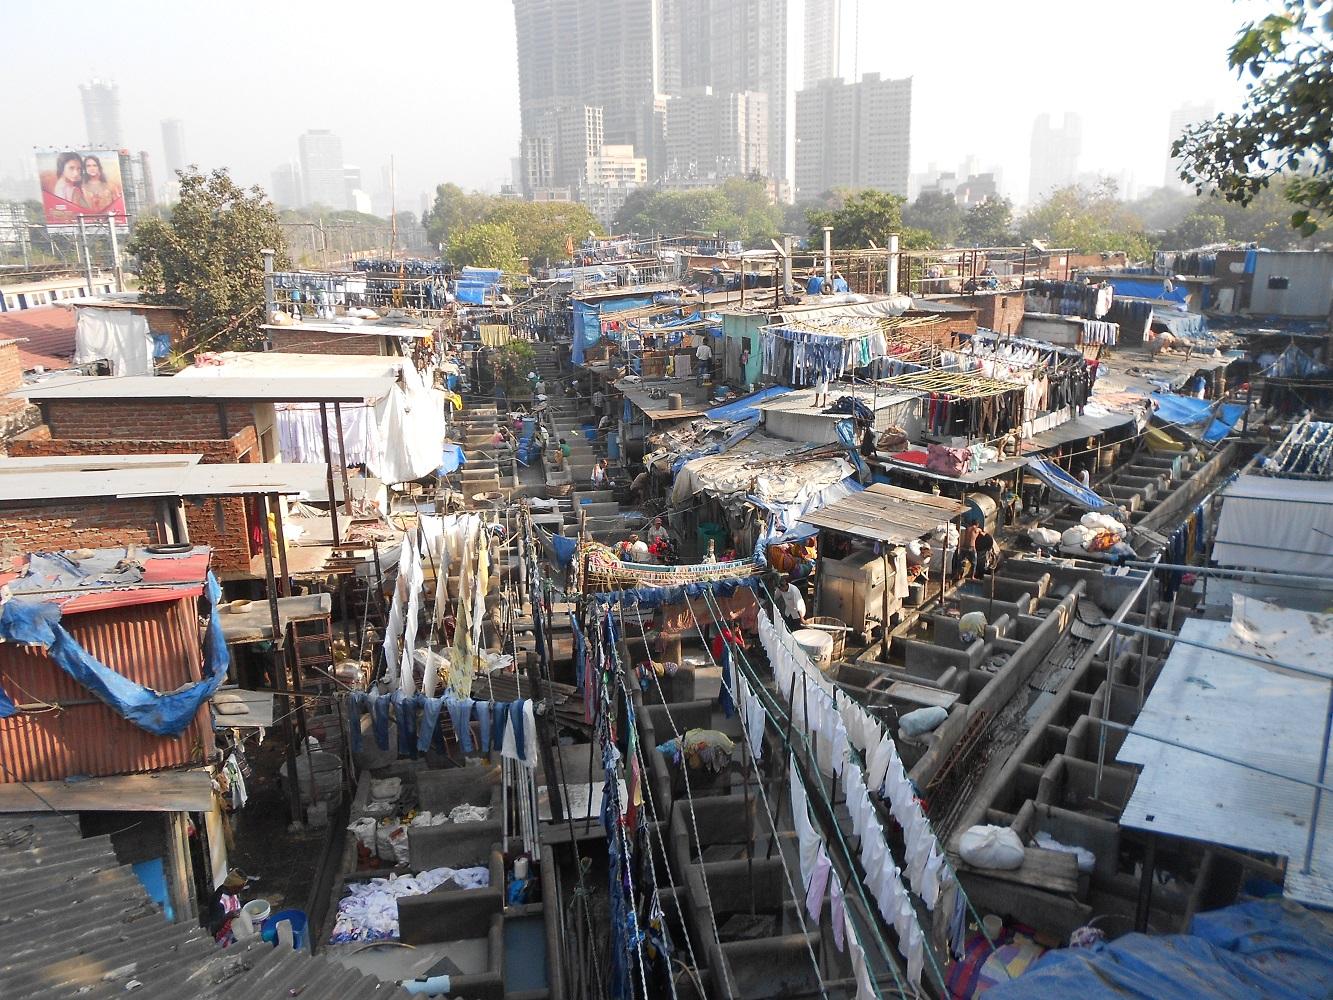 Dobi Ghat, die berühmte Wäscherei.